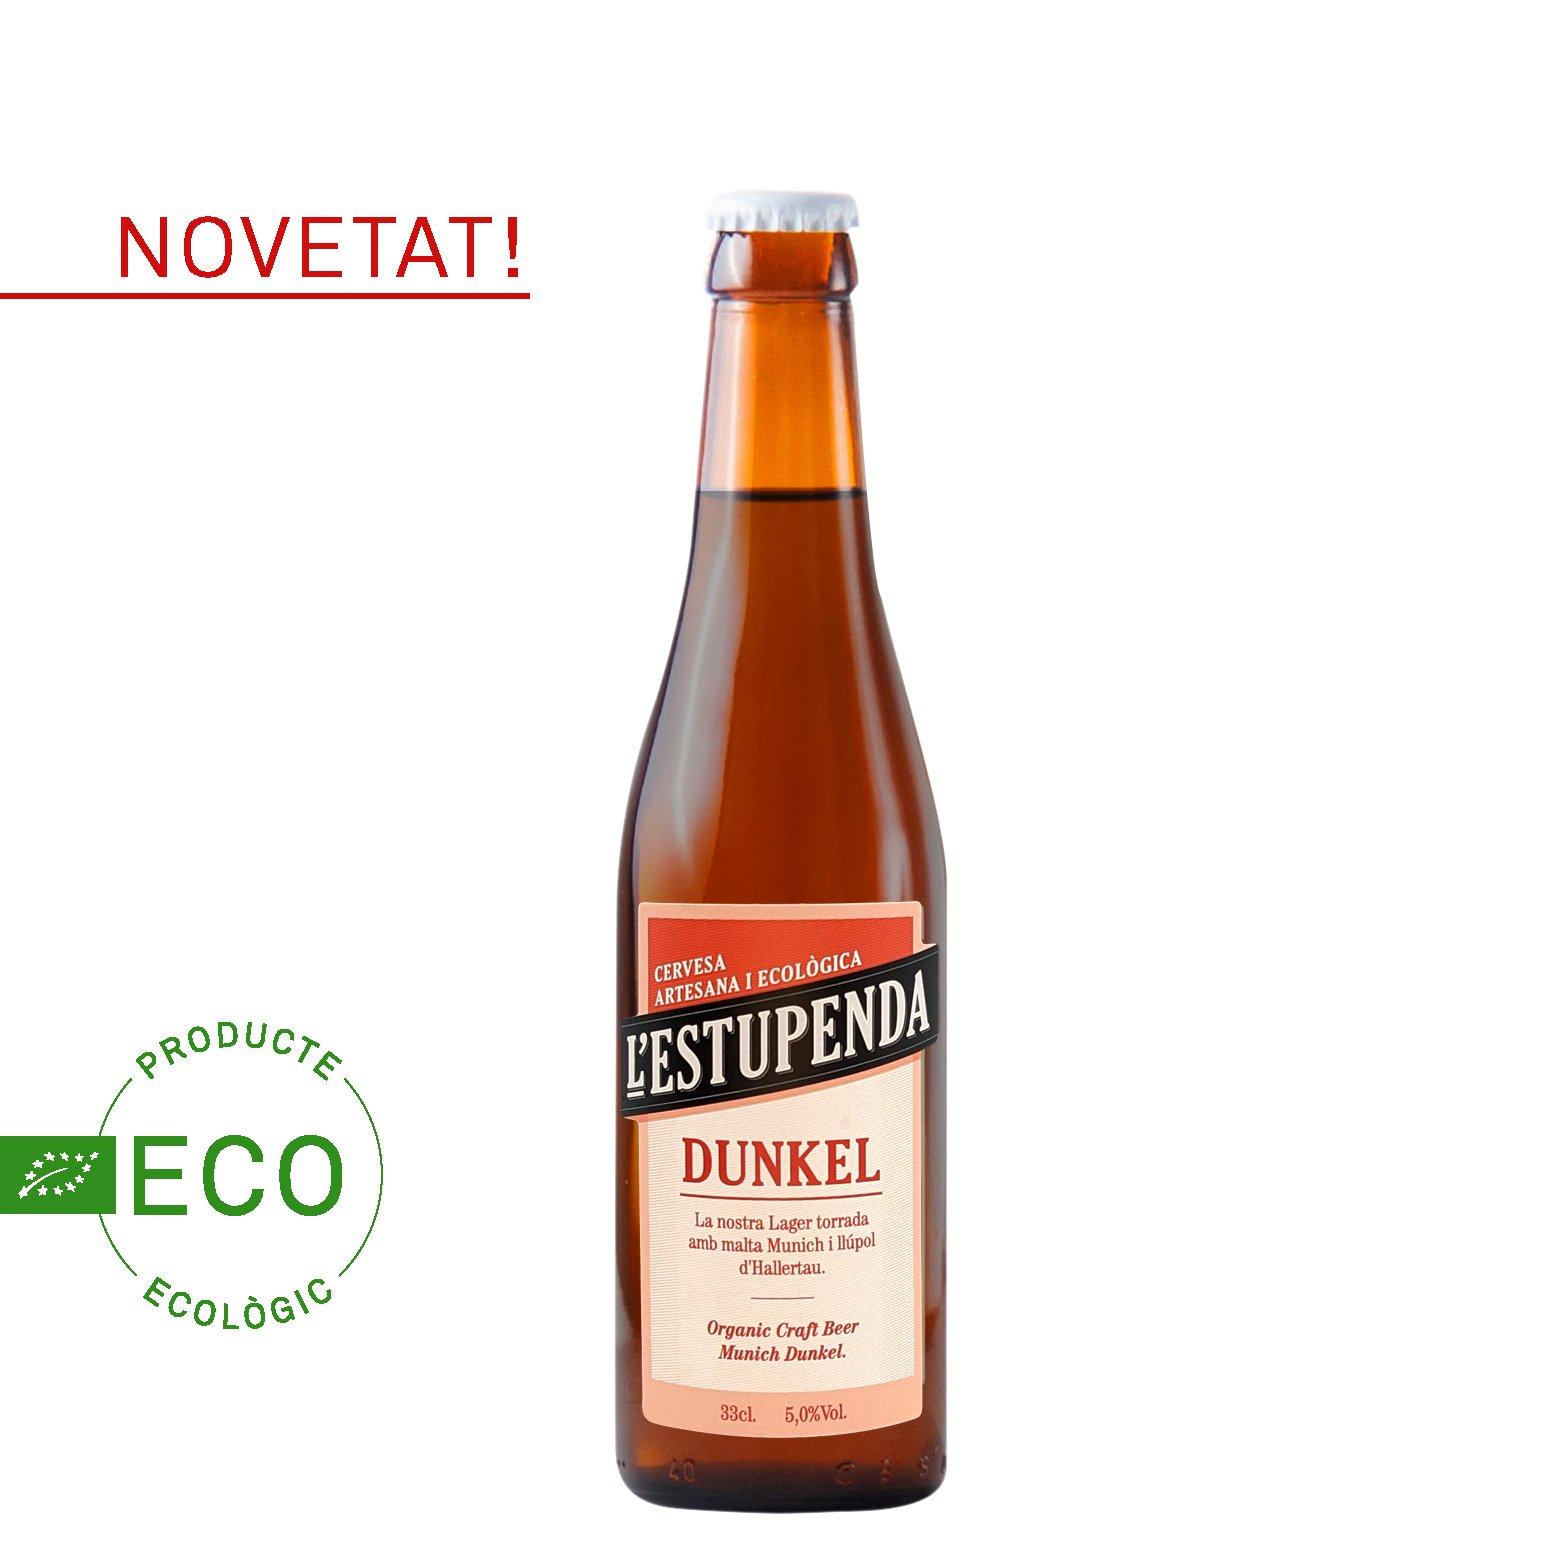 https://www.lestupenda.com/es/wp-content/uploads/sites/9/2021/04/Cervesa-Artesana-Ecològica-lEstupenda-Dunkel.jpg